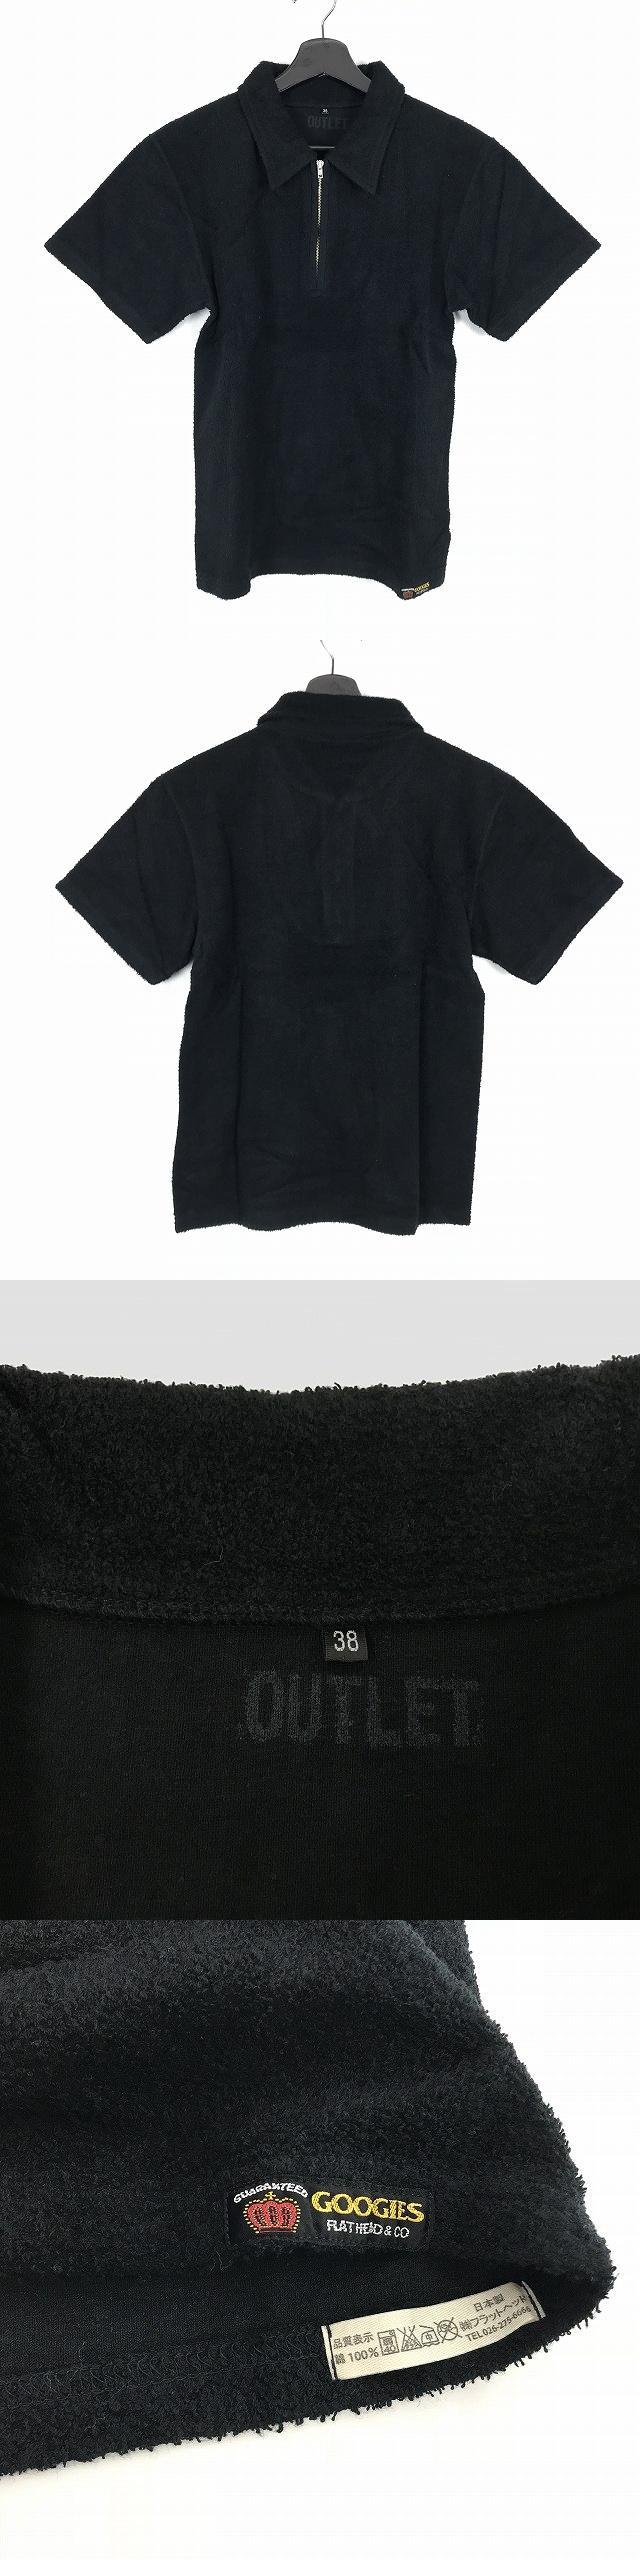 GOOGIES ハーフジップ プルオーバー パイル カットソー ポロシャツ 半袖 黒 ブラック 38